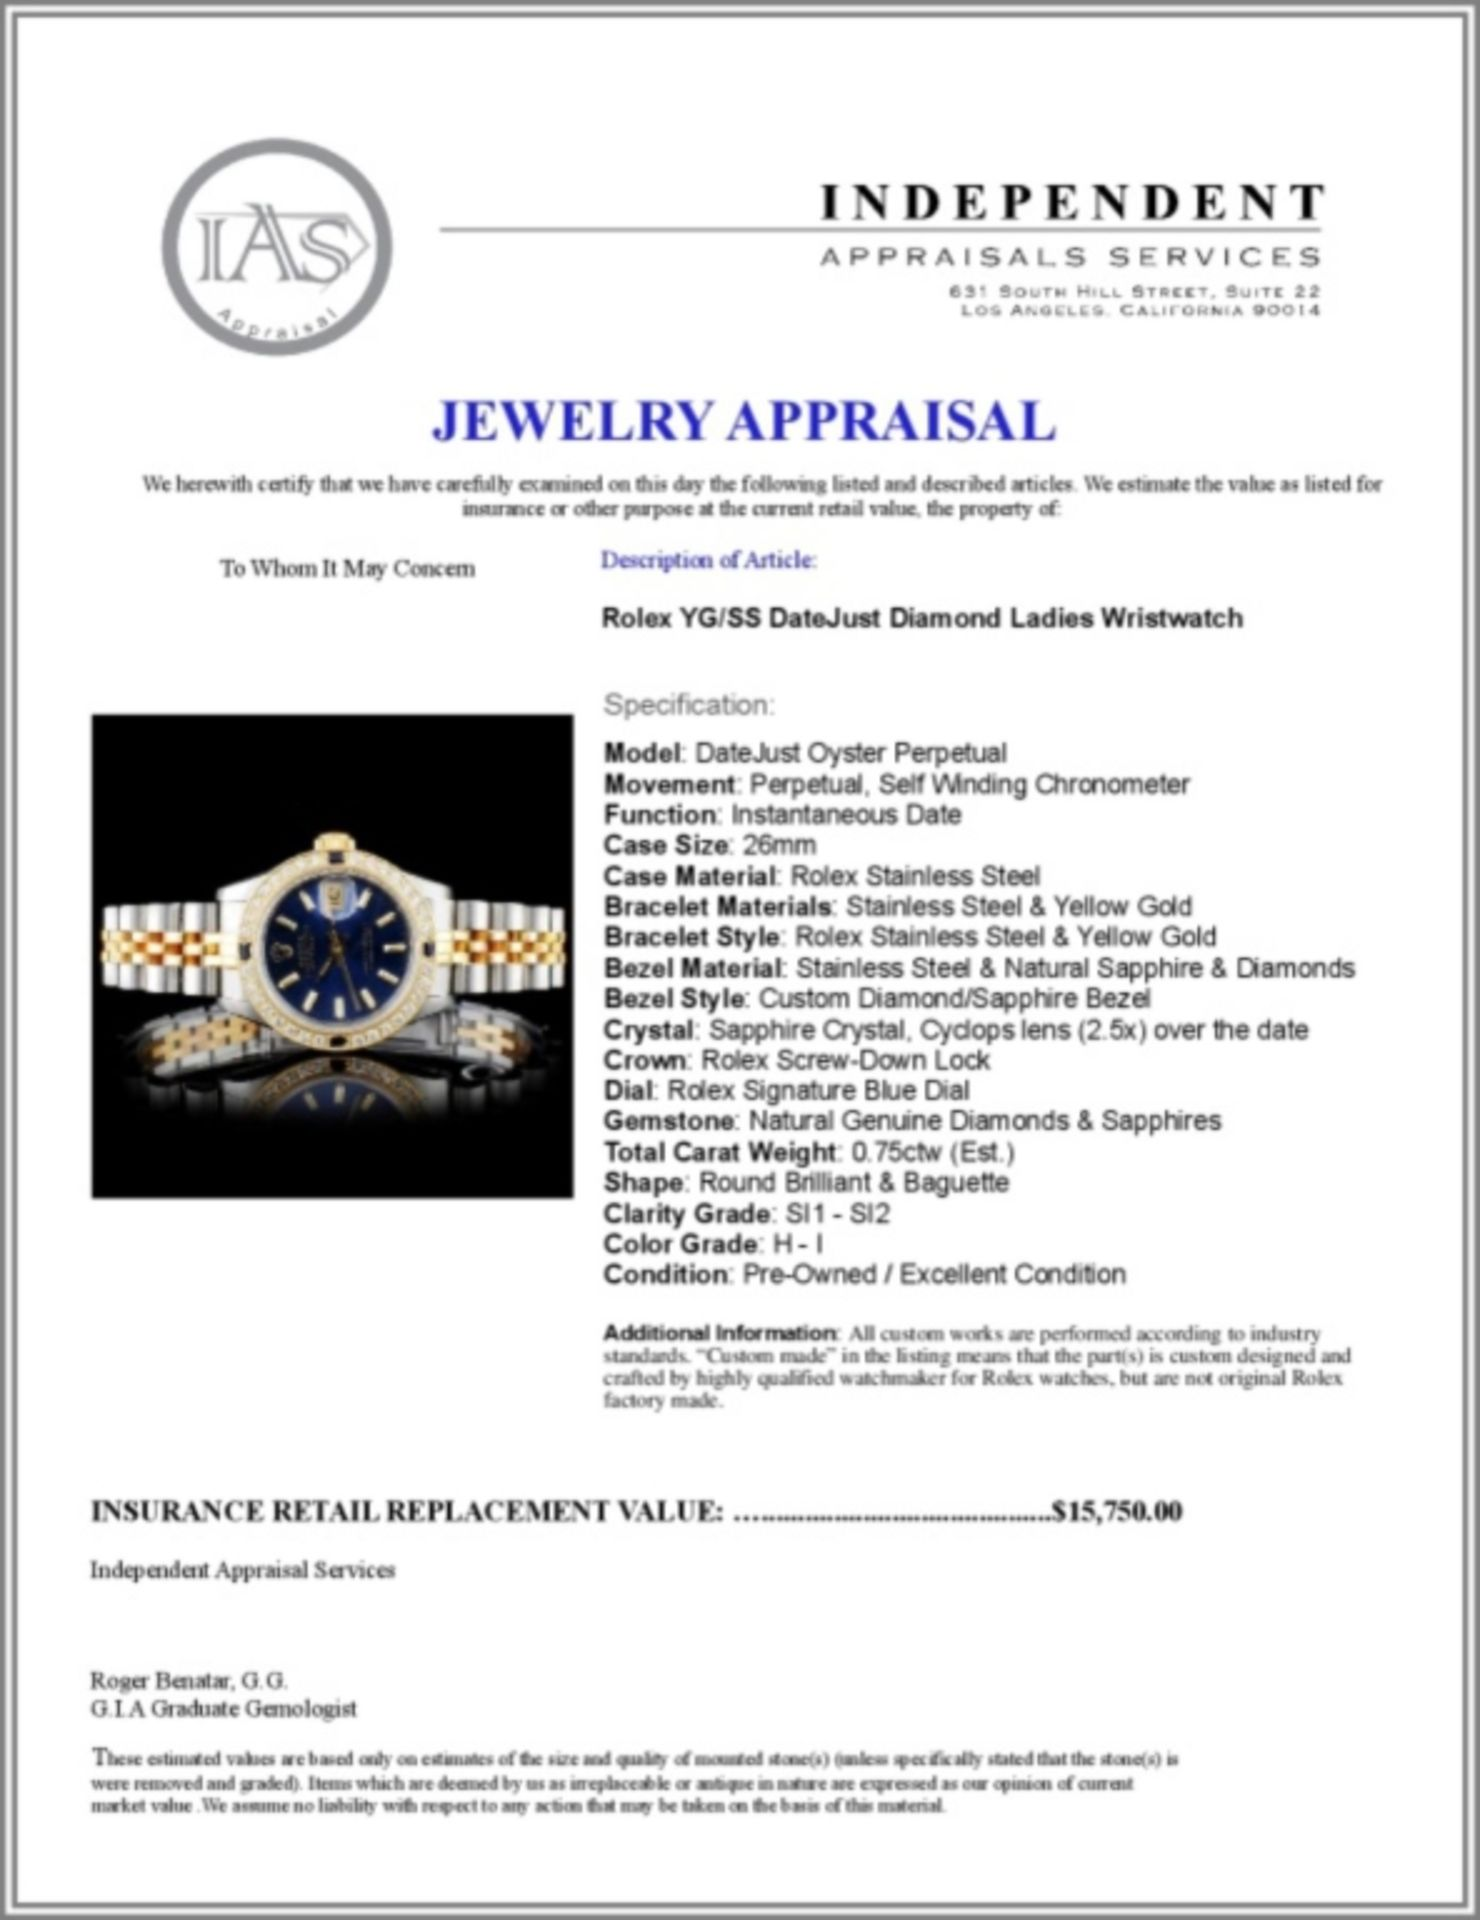 Rolex YG/SS DateJust 1.00ct Diamond Ladies Wristwa - Image 5 of 5